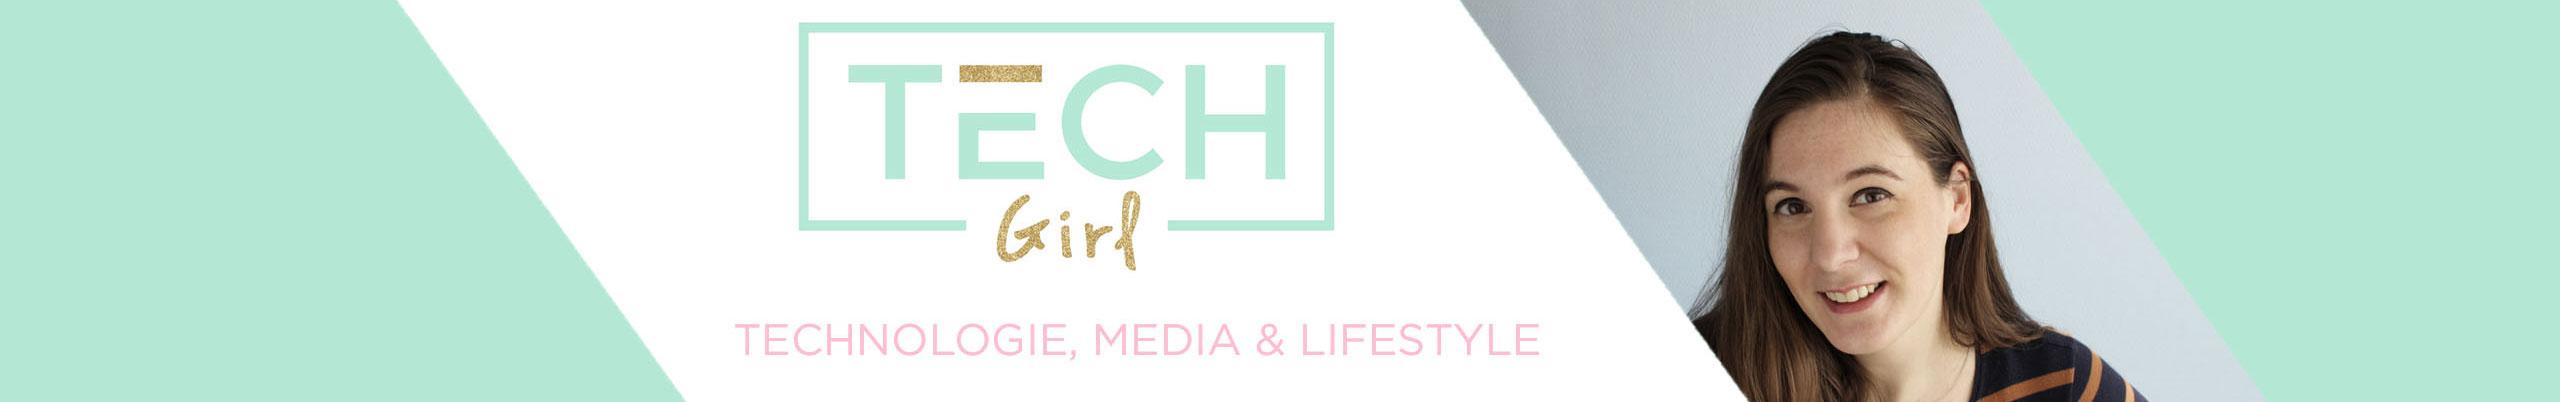 TechGirl logo